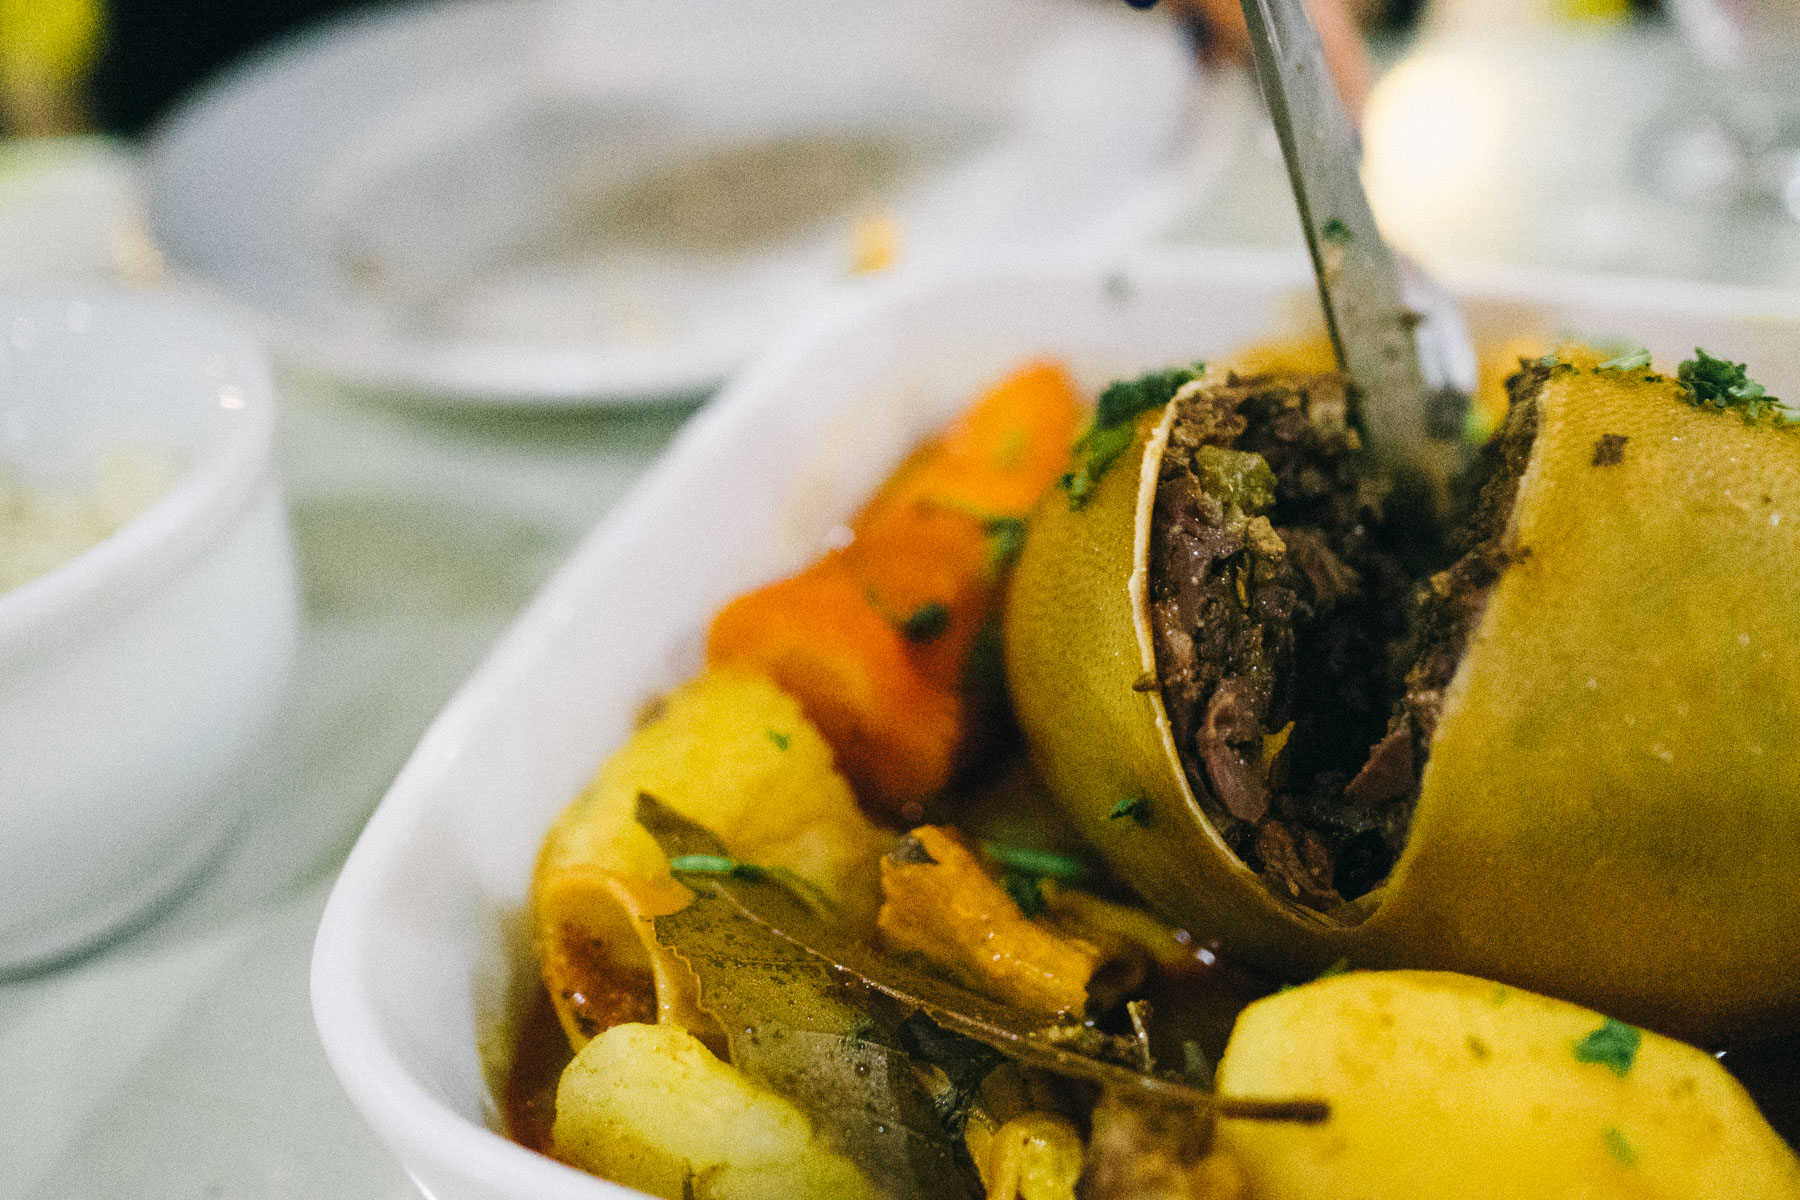 northeast-brazilian-cuisine-what-to-eat-recife-olinda-brazil-brasil-13